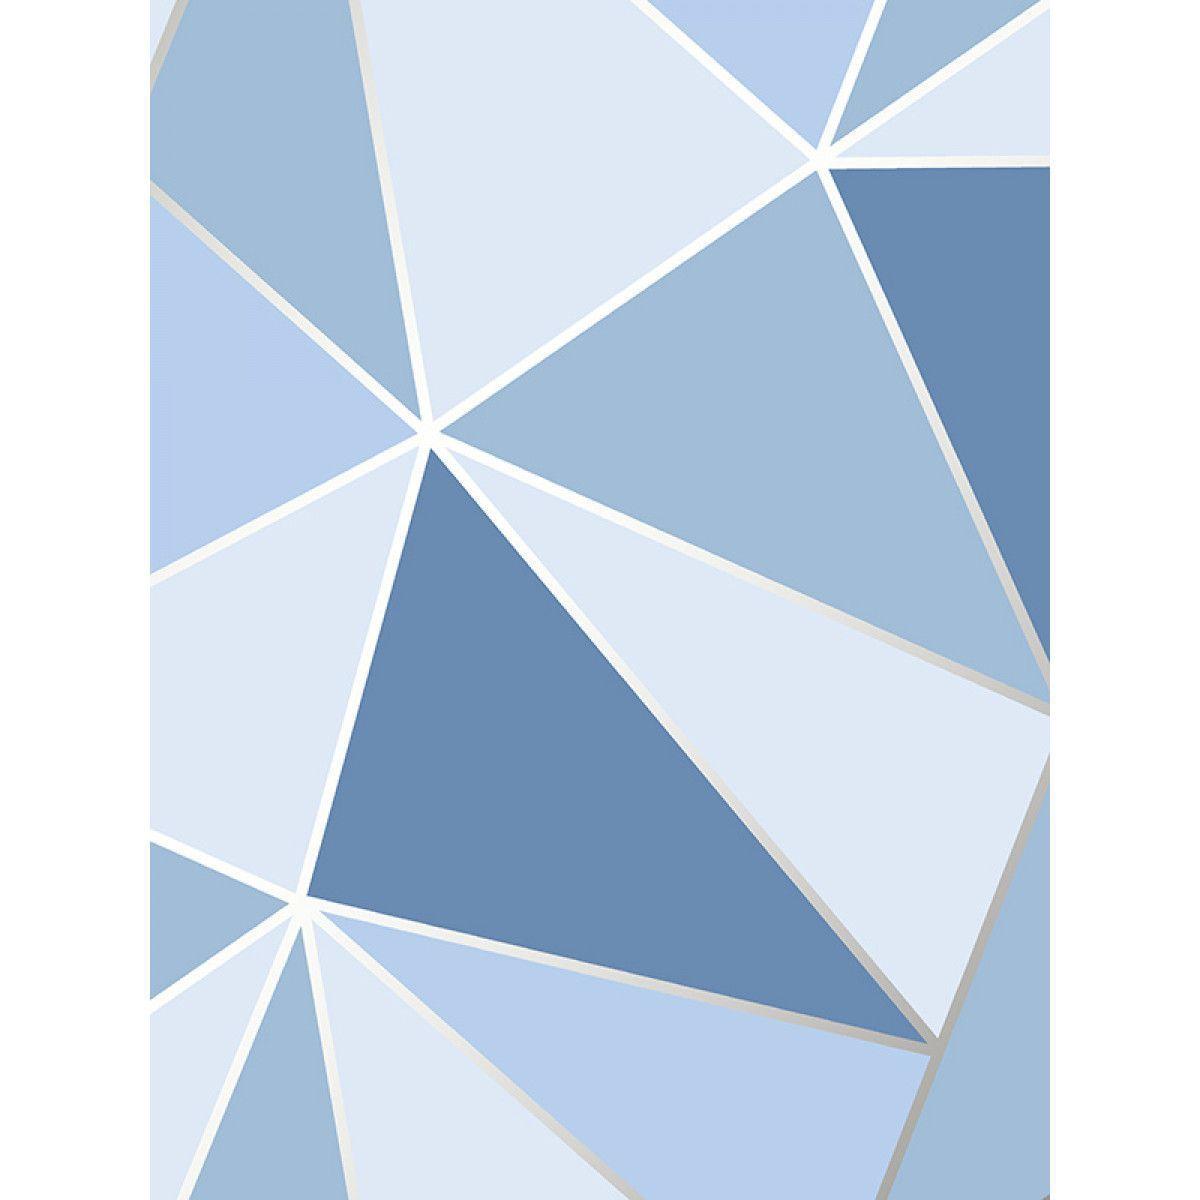 Papier Peint Geometrique Apex Bleu Fine Decor Fd41992 Petit Hotel R Fond Ecran Bleu En 2020 Fond Ecran Bleu Papier Peint Geometrique Ecran Bleu